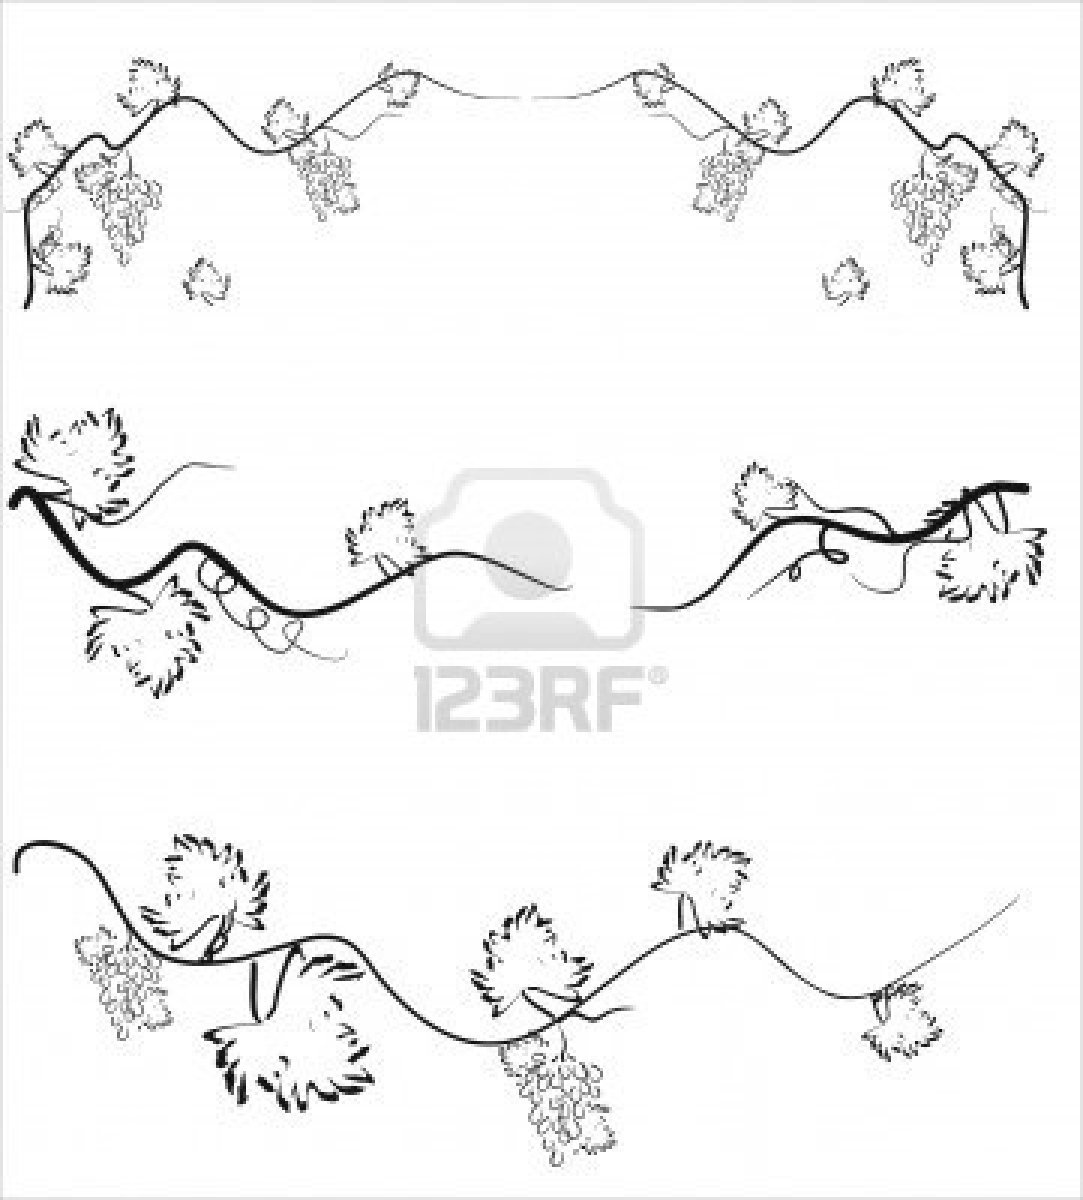 Coloriages imprimer raisin num ro 26083 for Raisins coloring page